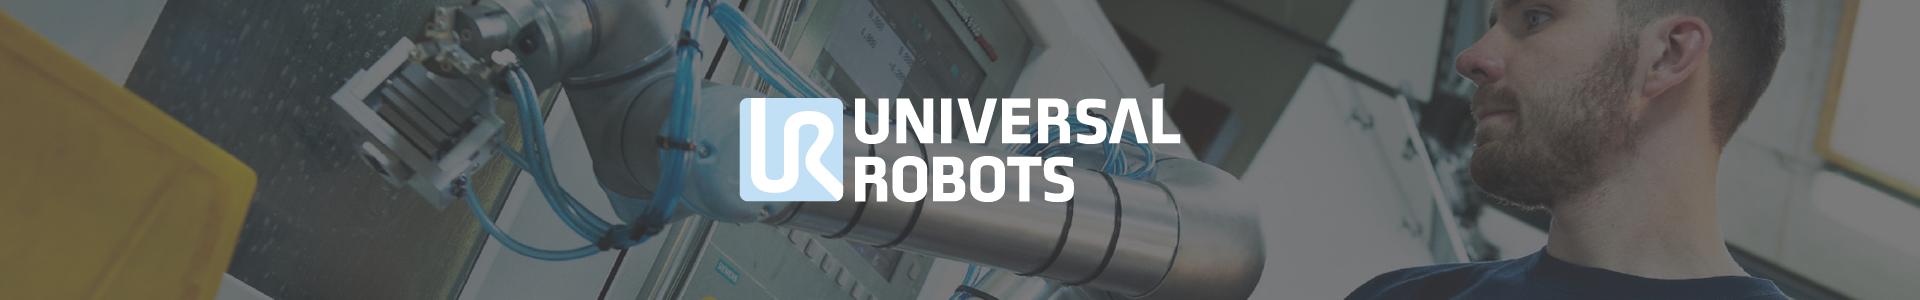 Universal Robots distributor in Indiana, Wisconsin, Michigan, Ohio, Pennsylvania, West Virginia. New York